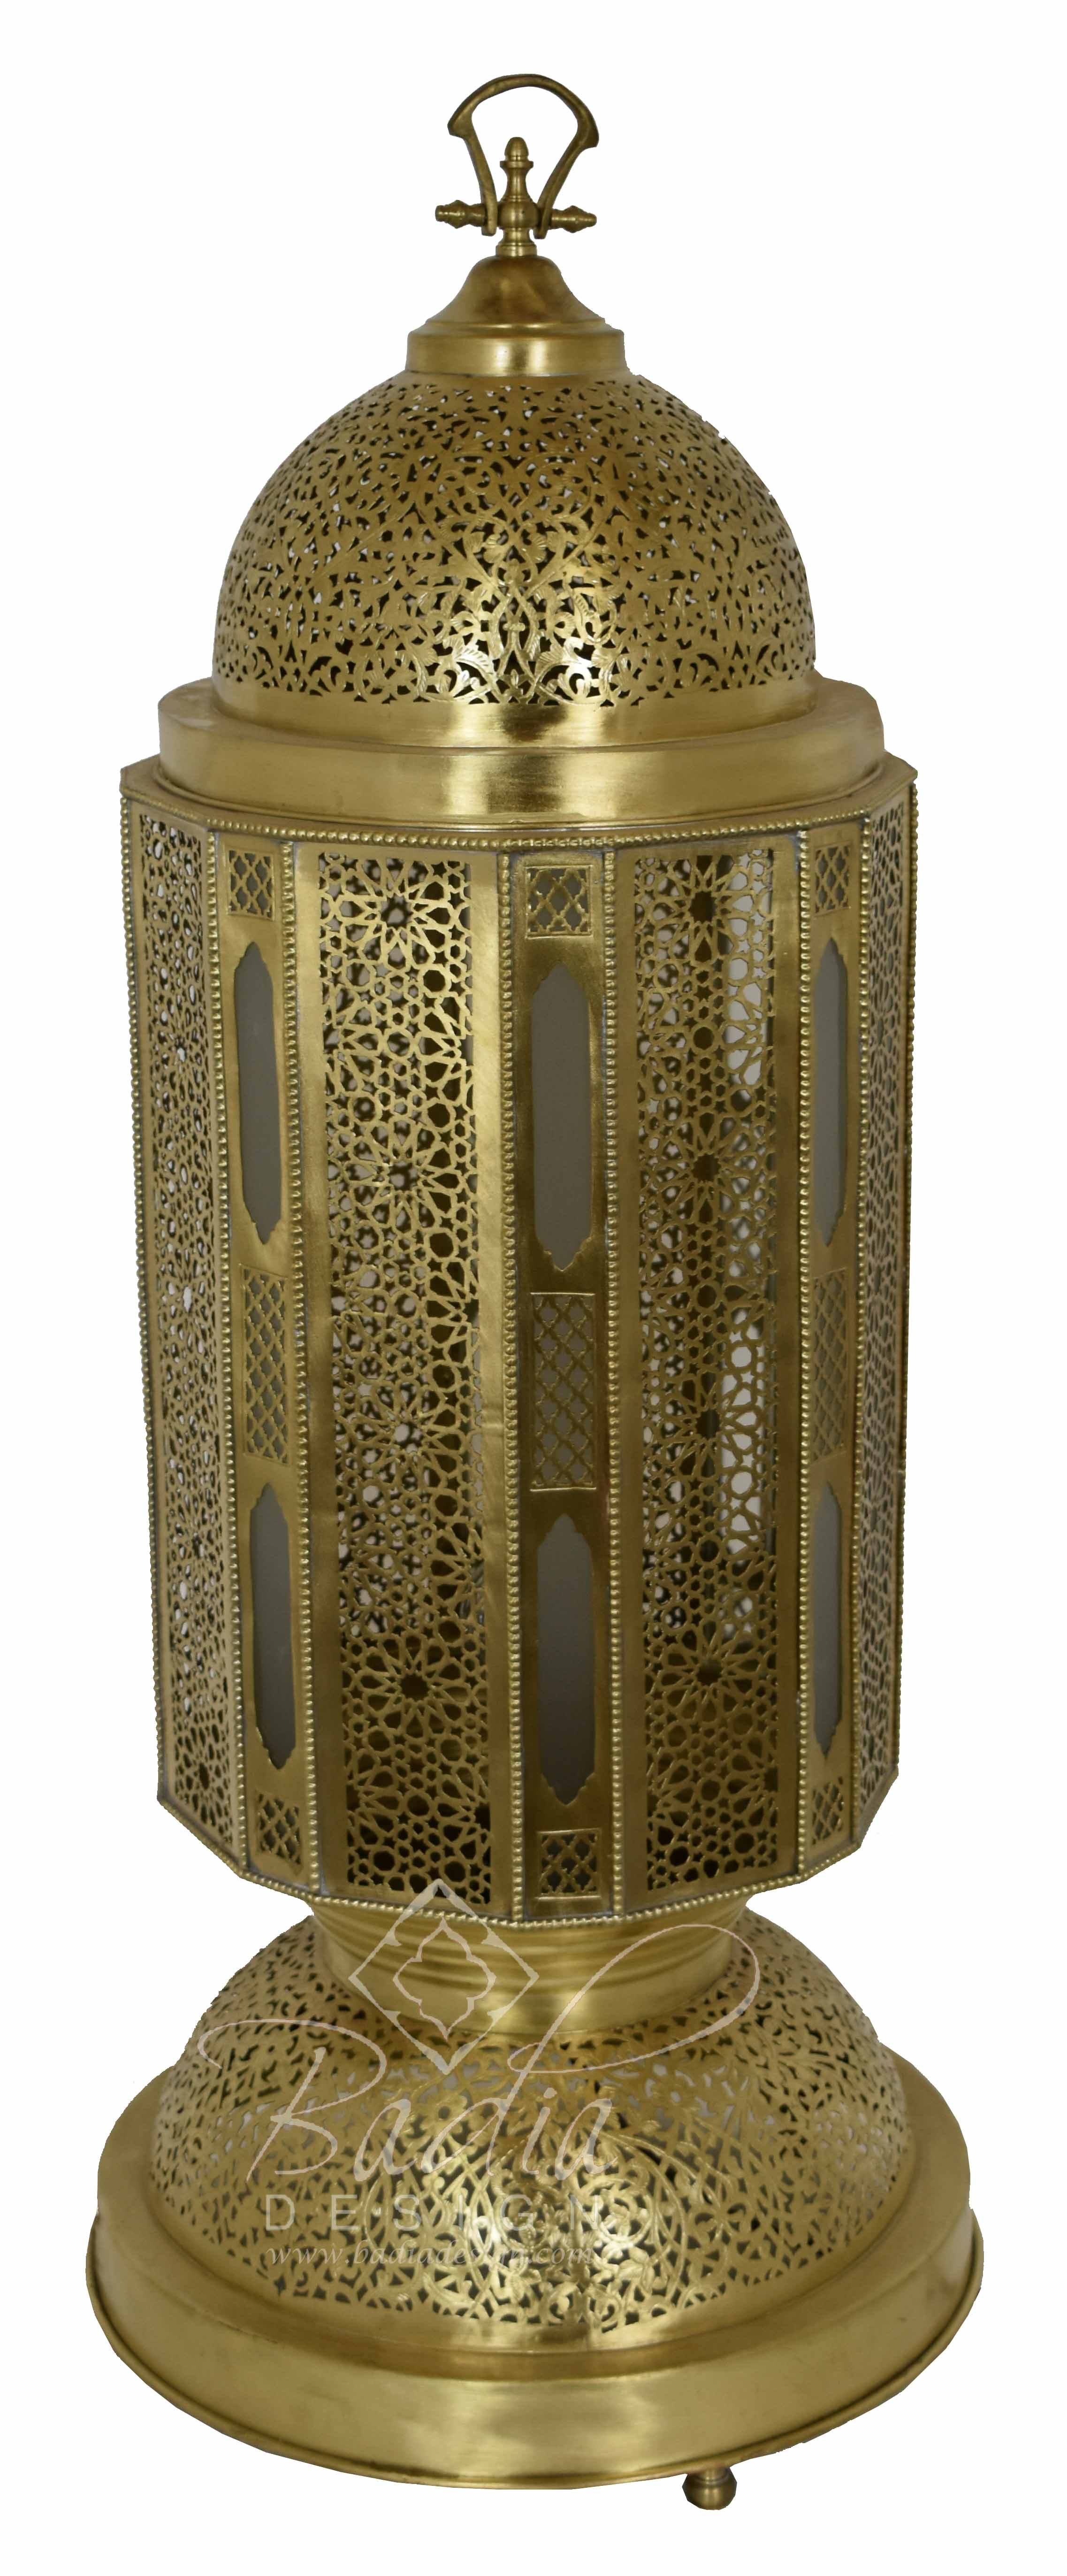 moroccan-brass-floor-lantern-with-white-glass-lig409-1.jpg